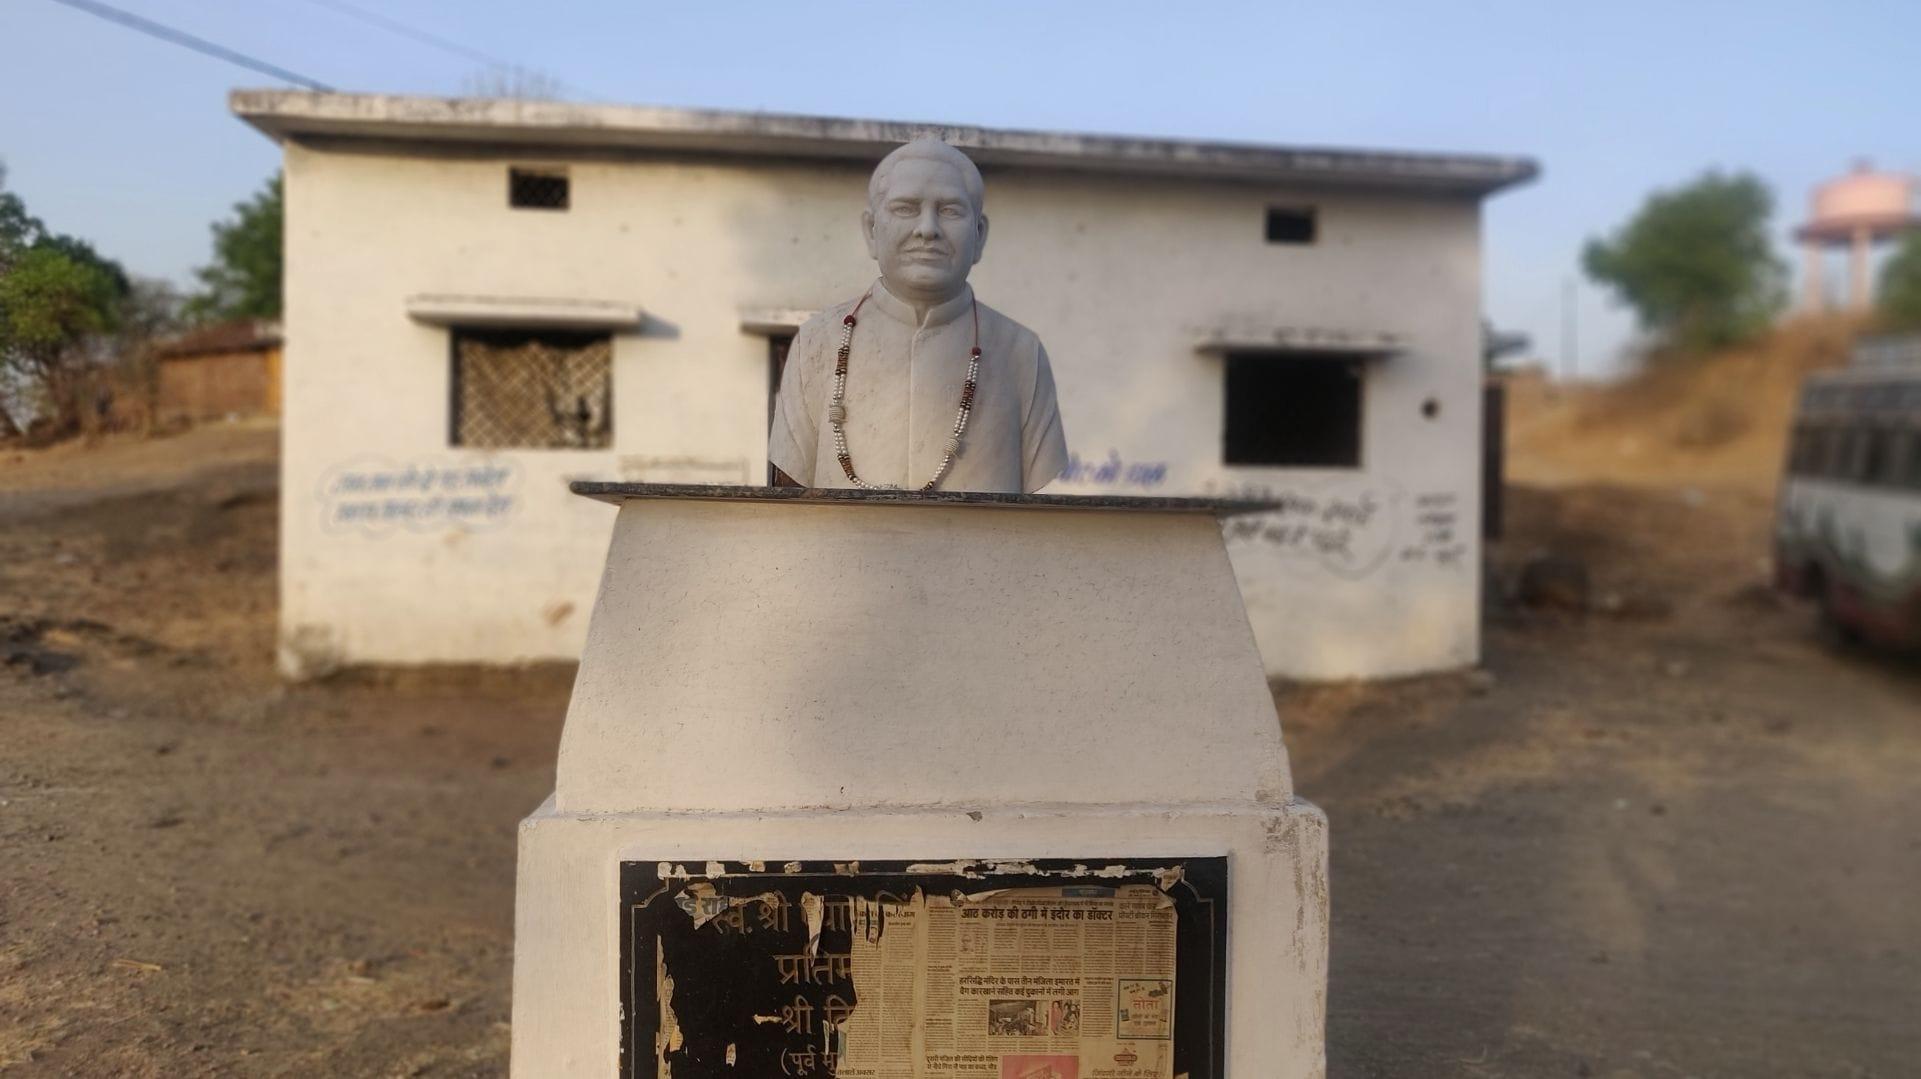 20. An installation in memory of Pyar Singh Nenama